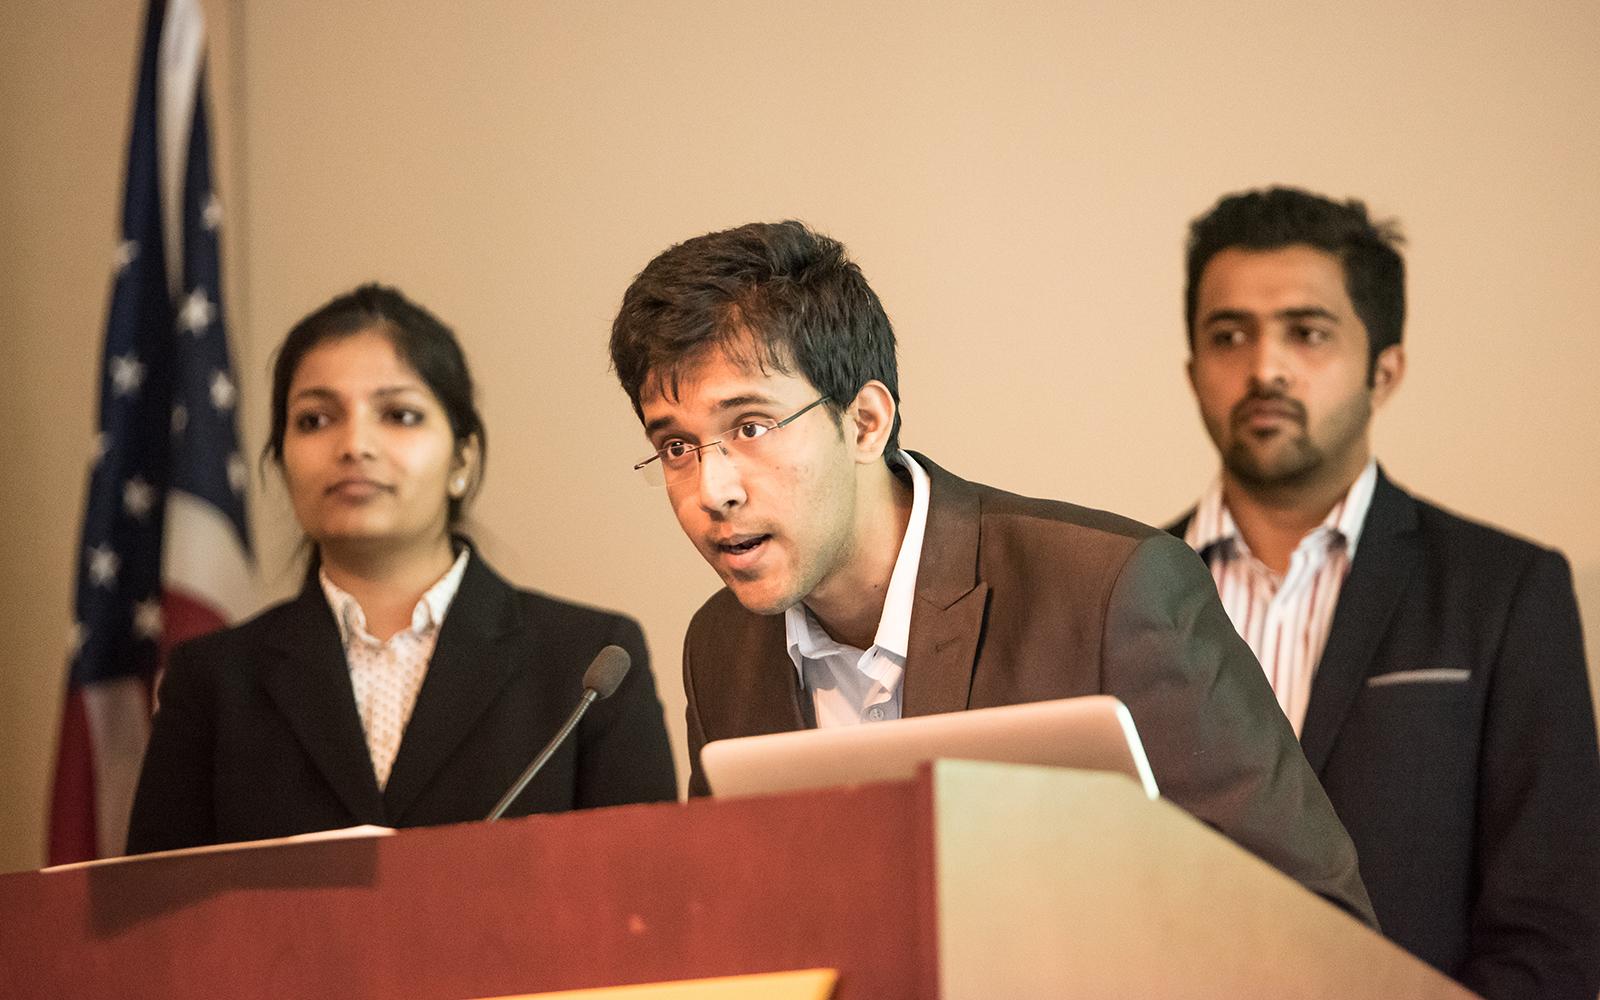 MSBAPM students Karpagam Vinayagam, Anoop Ramathirtha, and Suhas Nadiga, whose team came in third place. (Nathan Oldham/UConn School of Business)